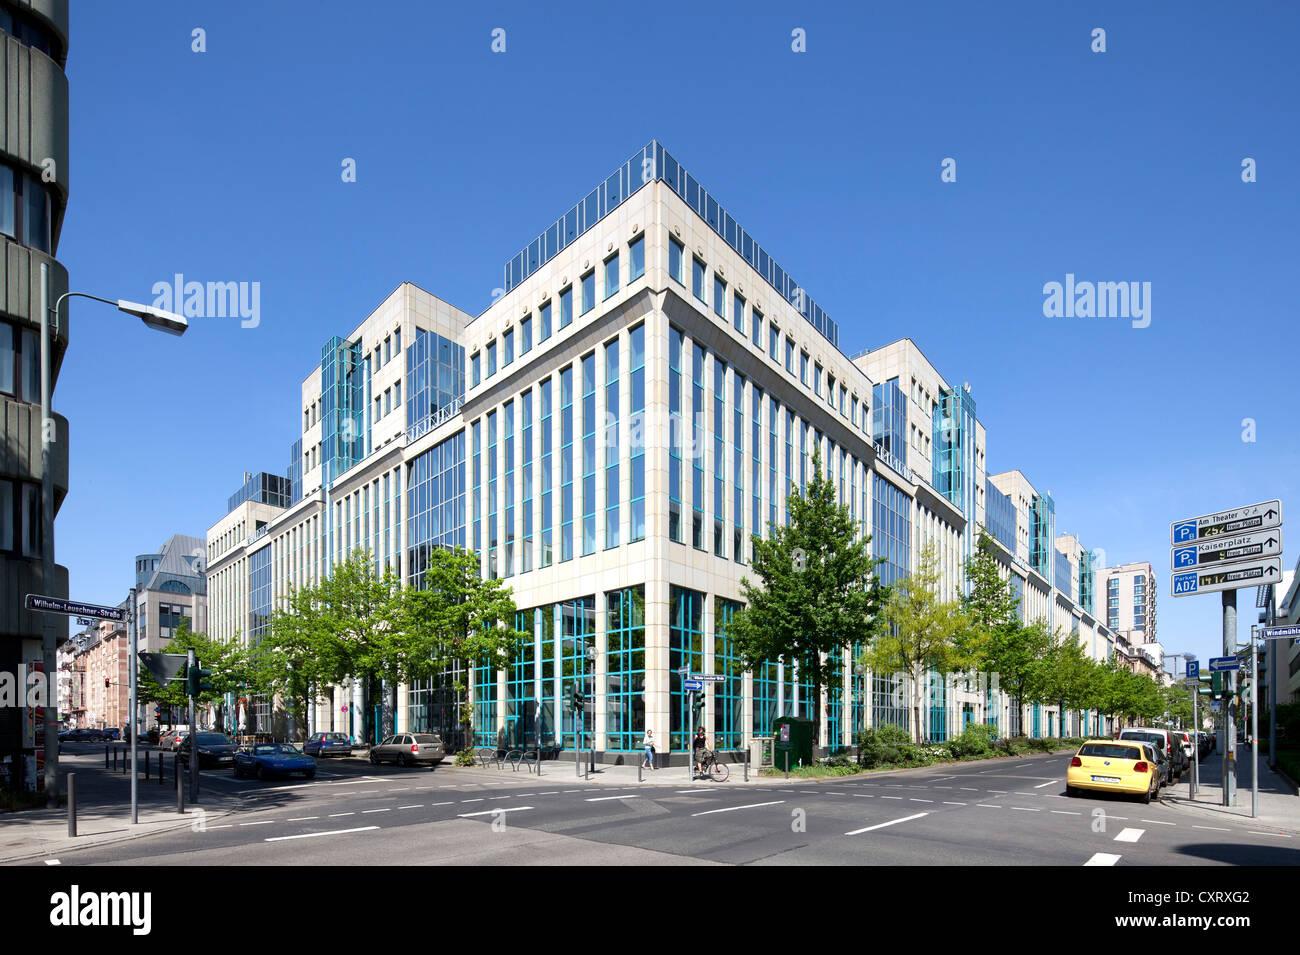 Office buildings on Wilhelm-Leuschner-Strasse, Frankfurt am Main, Hesse, Germany, Europe, PublicGround - Stock Image